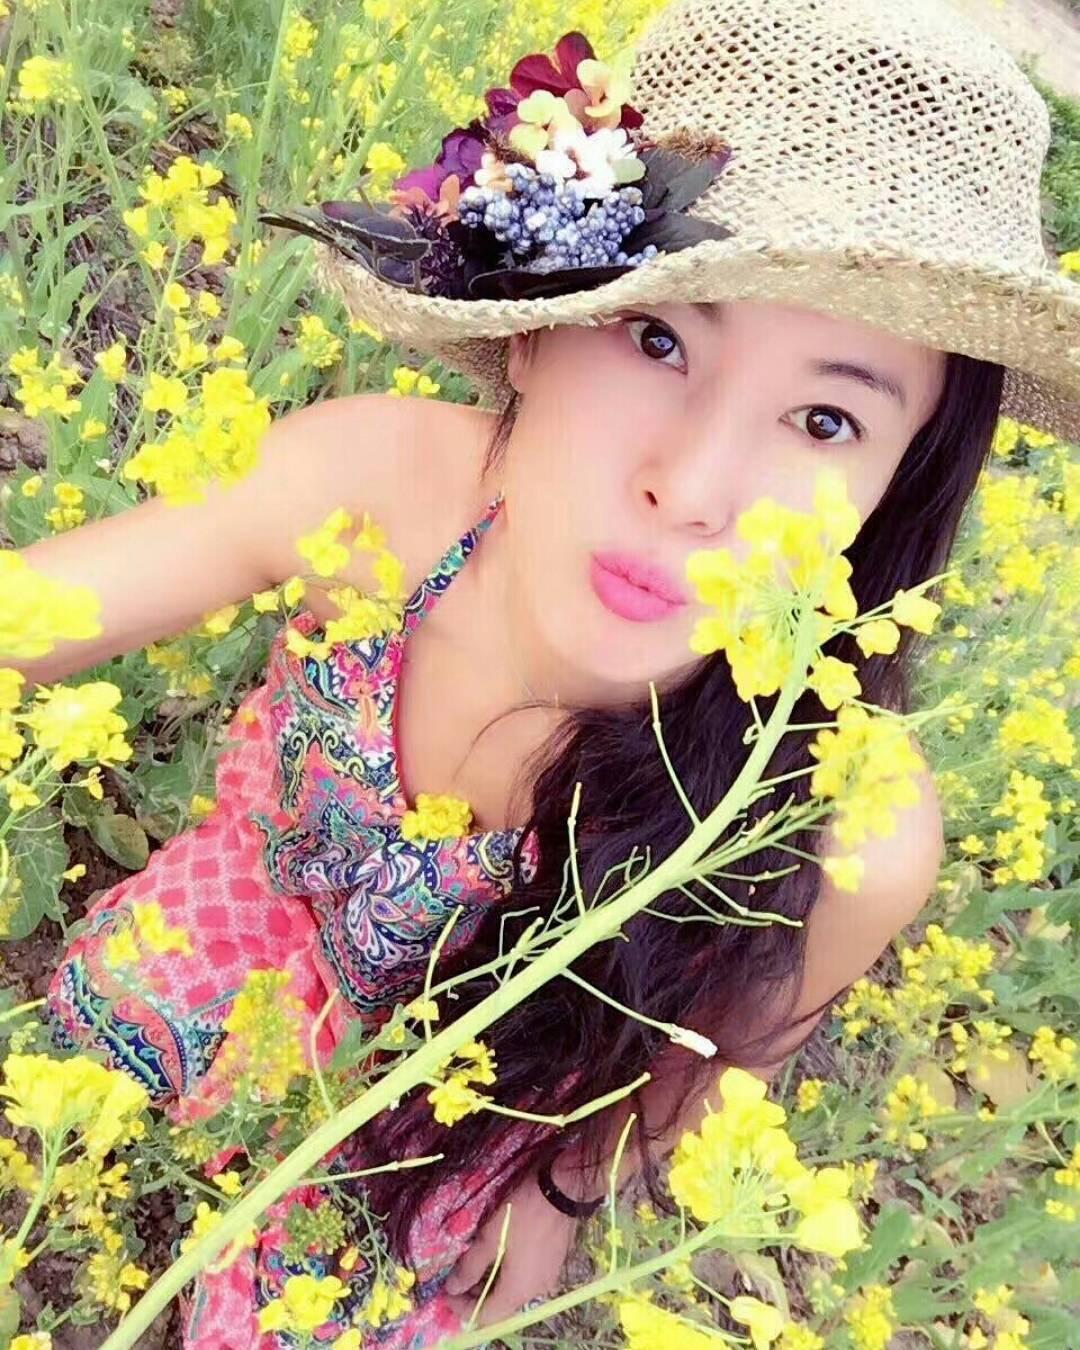 Liu Yelin